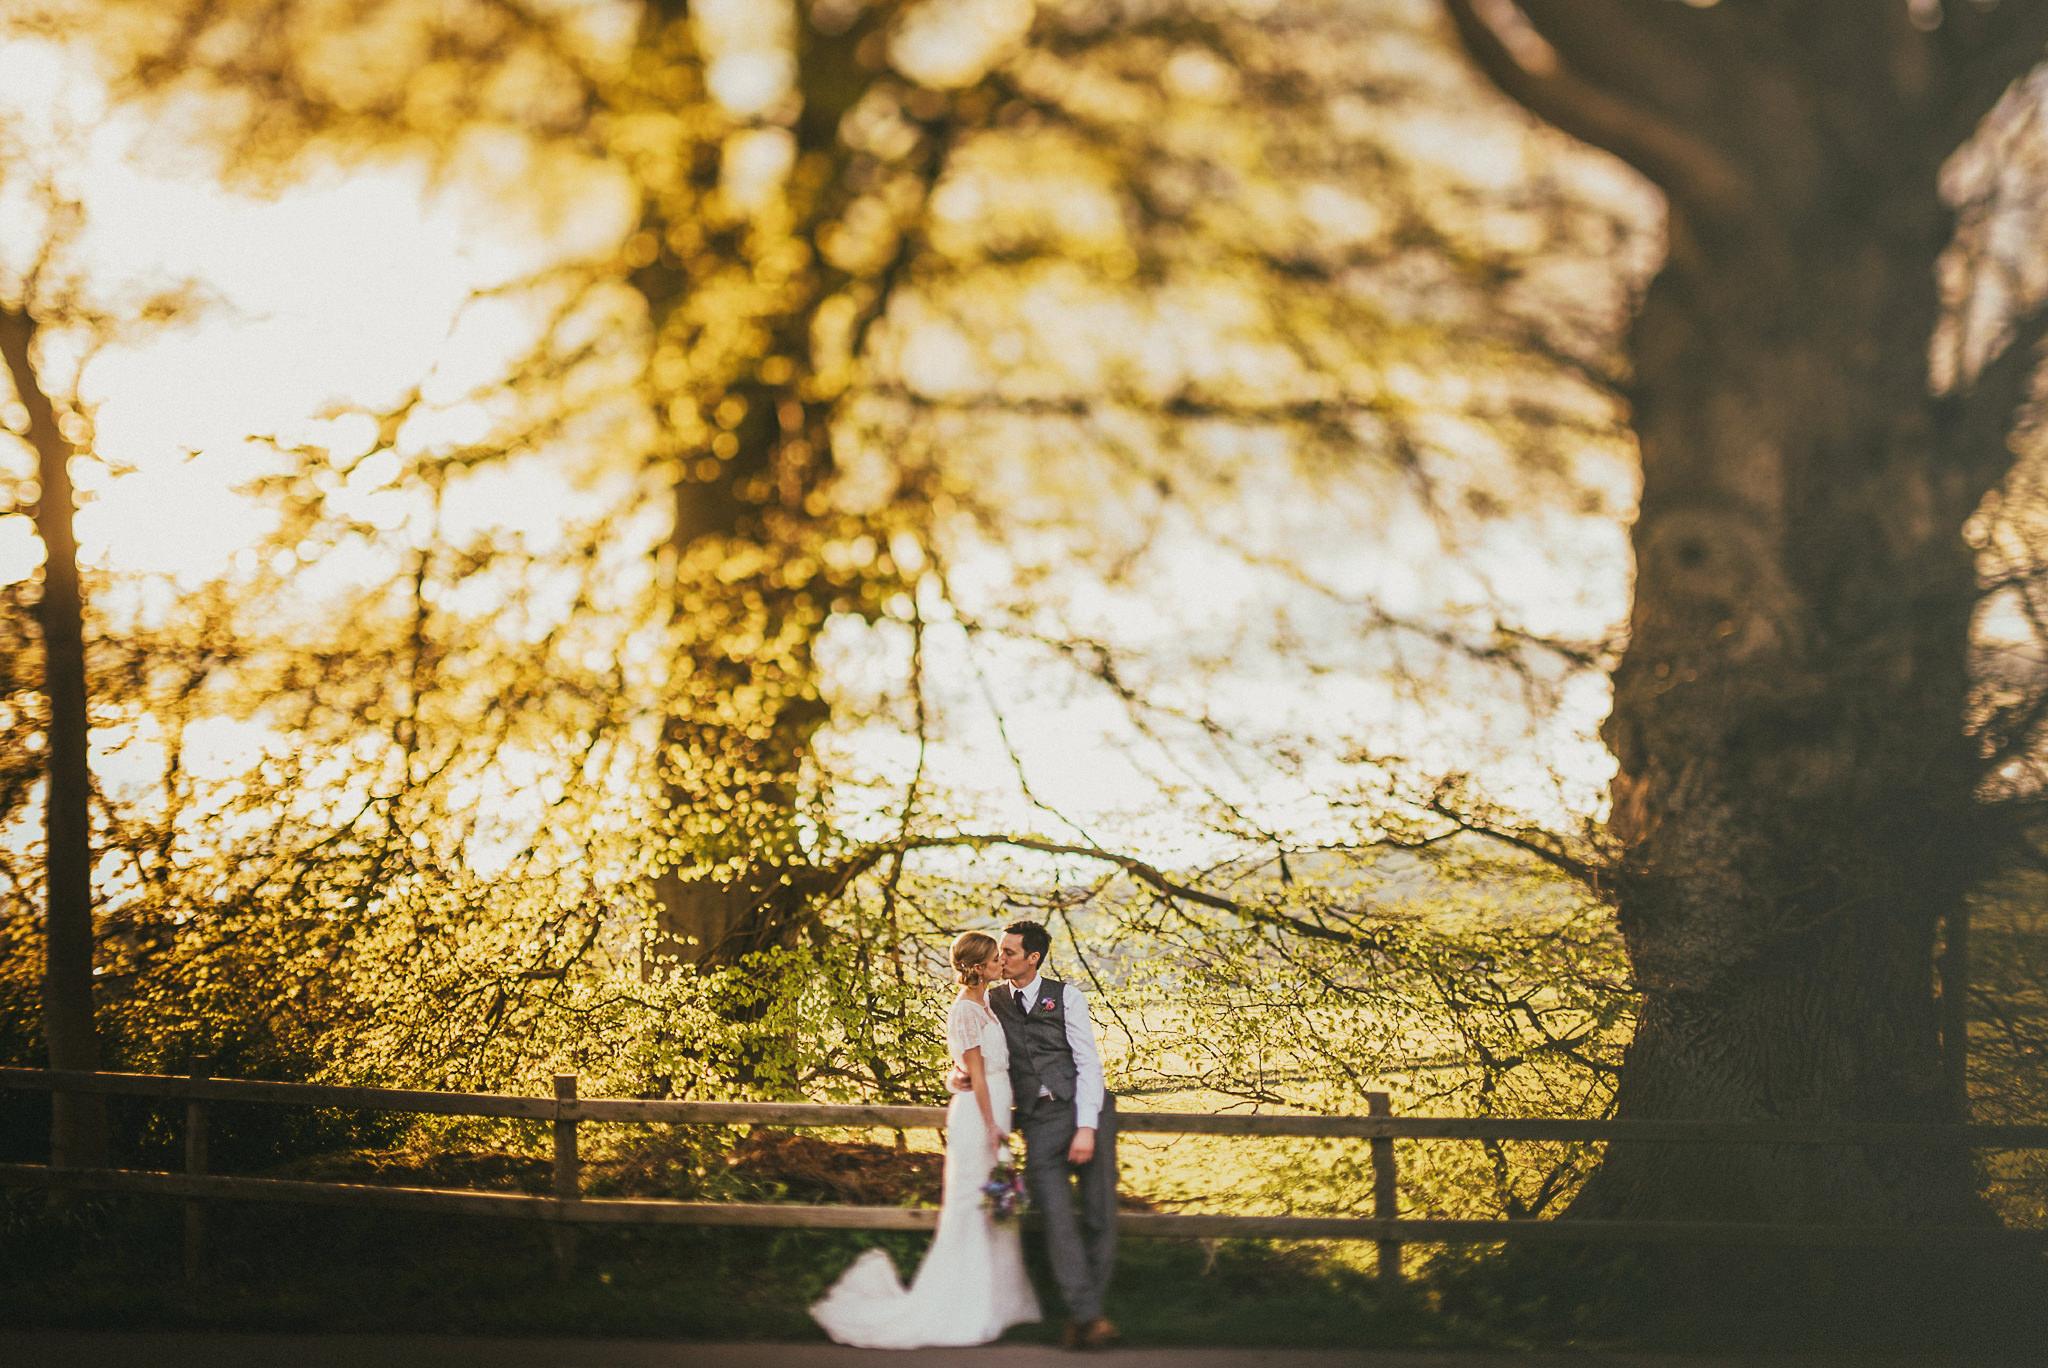 plas-isaf-corwen-north wales wedding-photography-photographer-91074